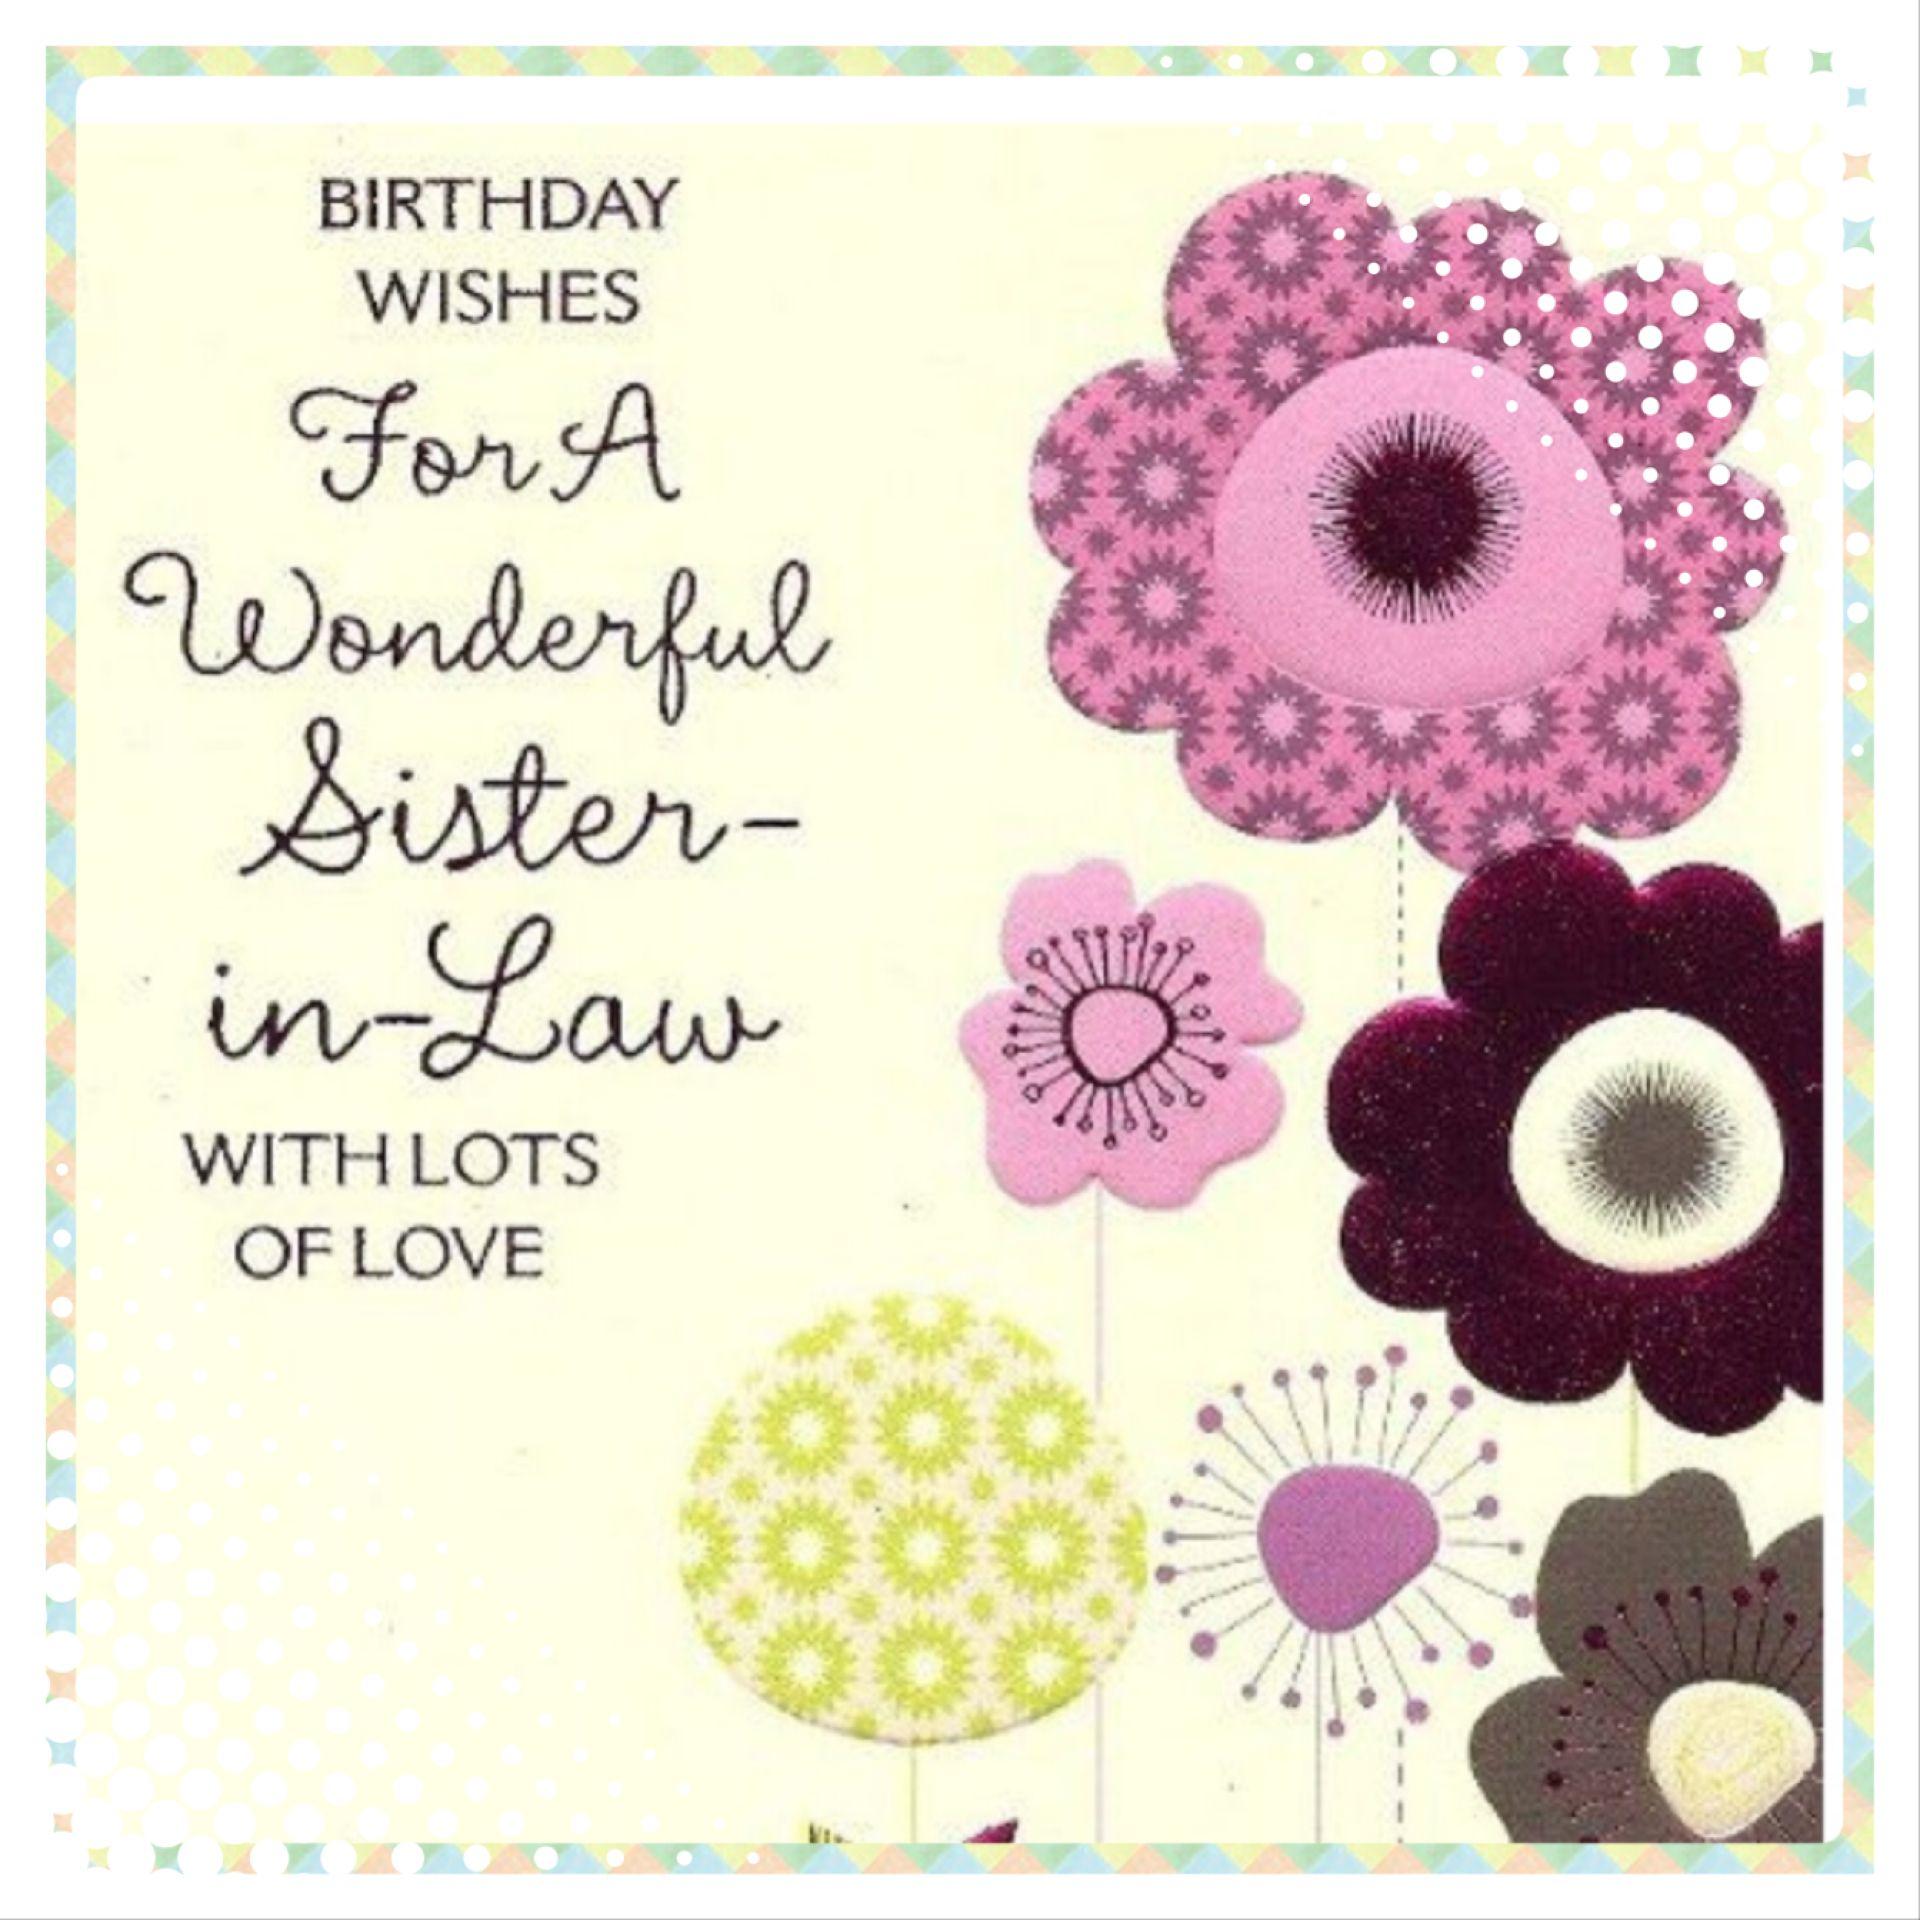 Pin By Grammie Newman On Birthday Birthday Wishes Birthday Happy